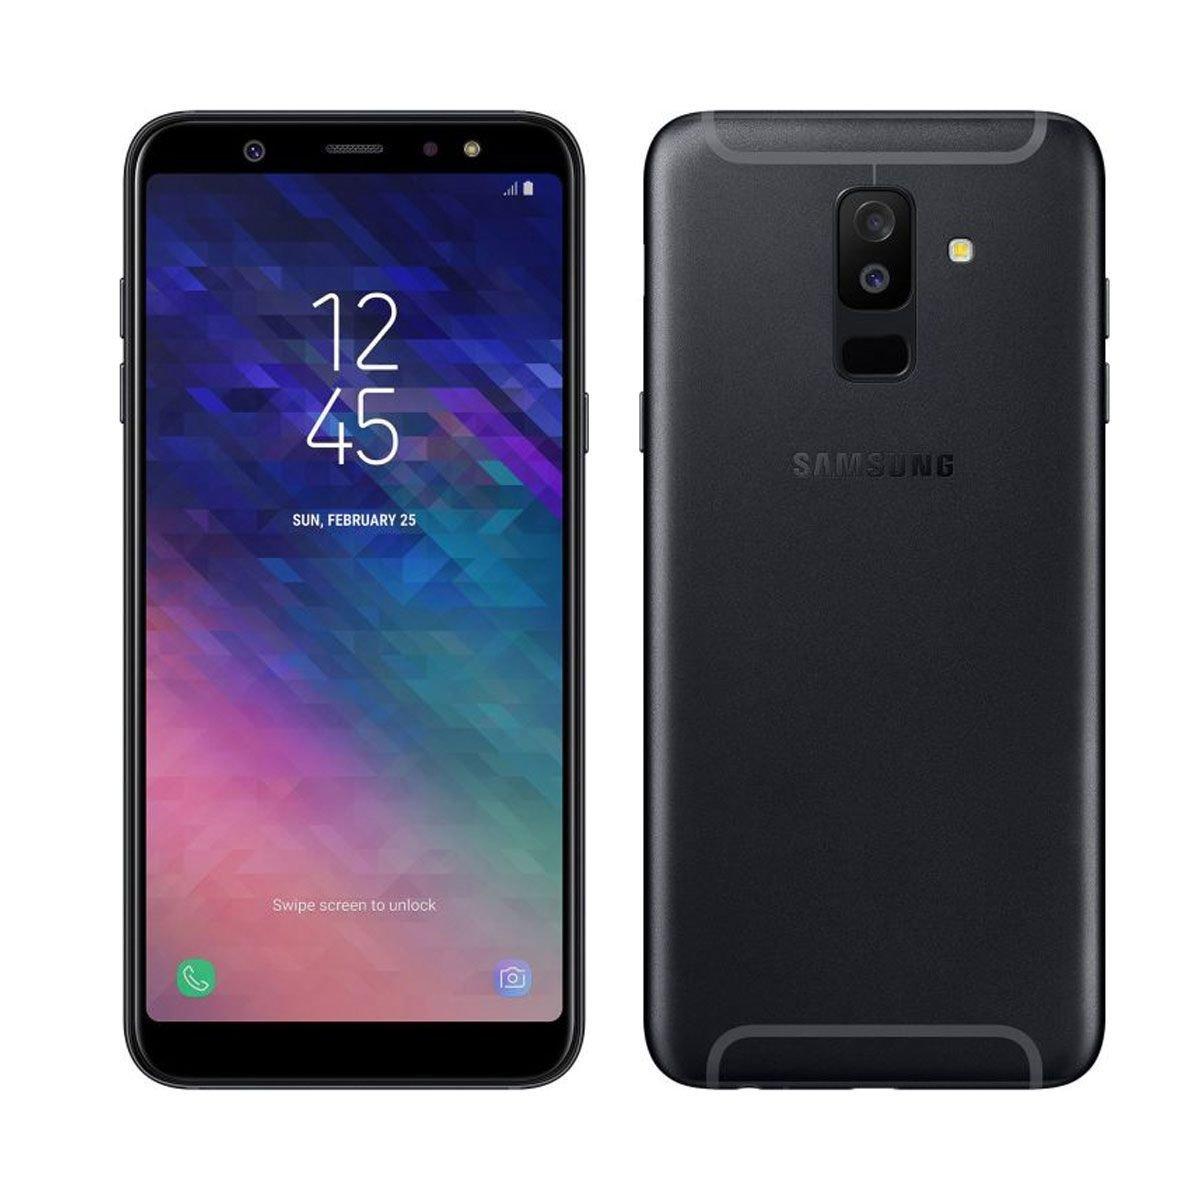 Samsung Galaxy A6+ One UI 2.0 Android 10 Update | A605FNXXU5CTC8 1